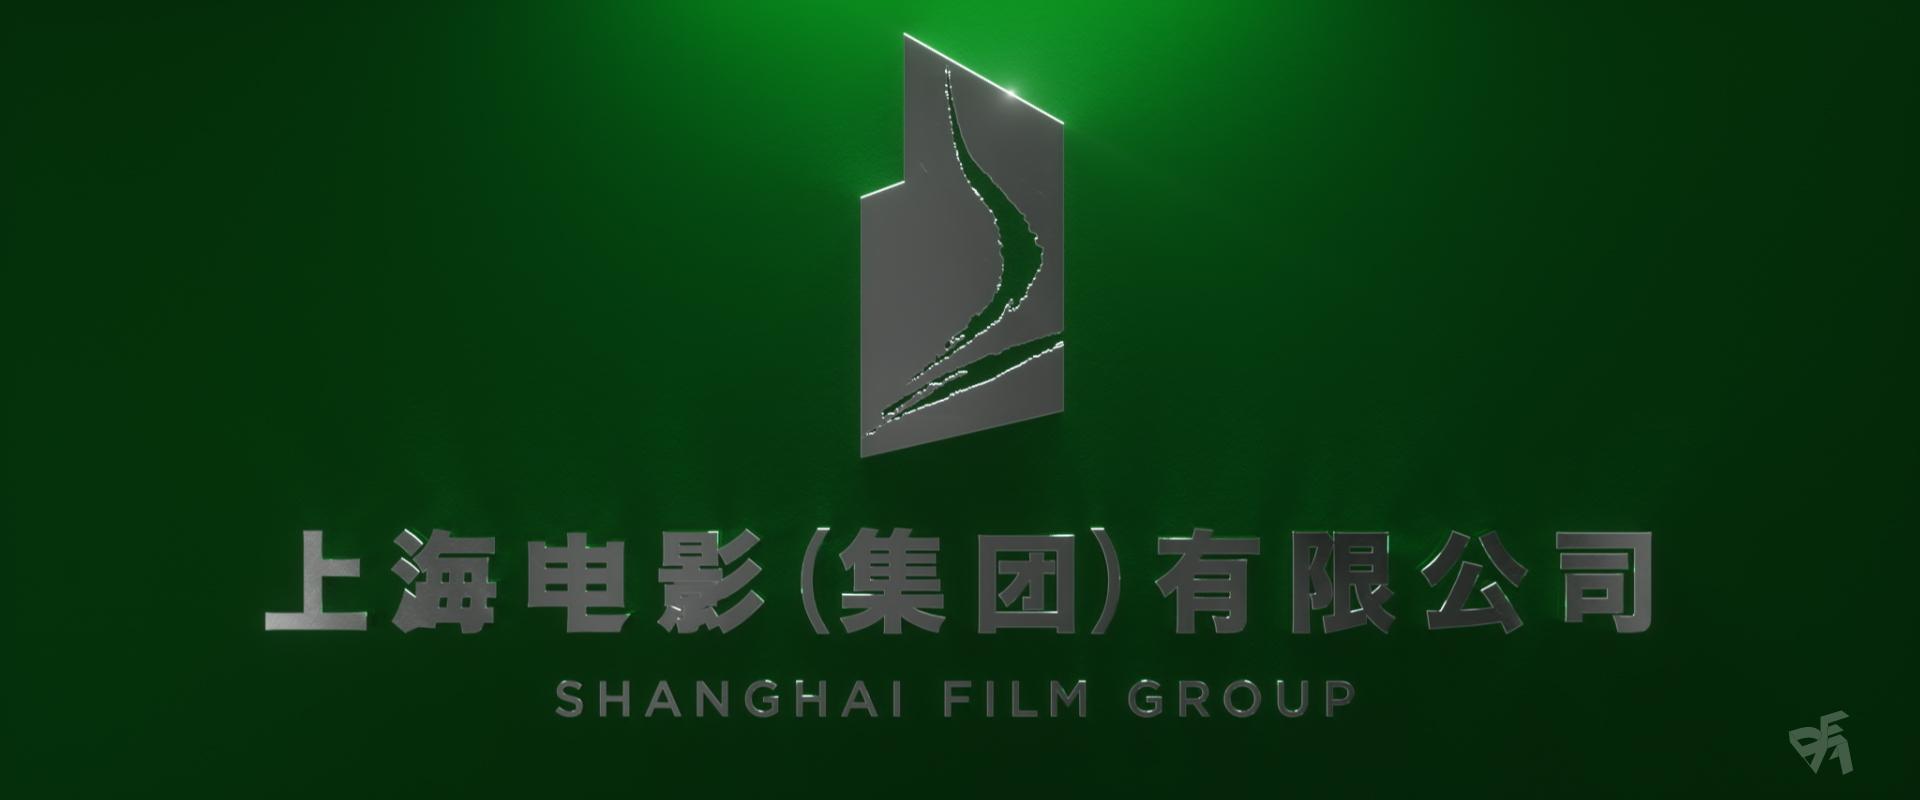 ShanghaiFilmGroup_STYLEFRAME_04.jpg